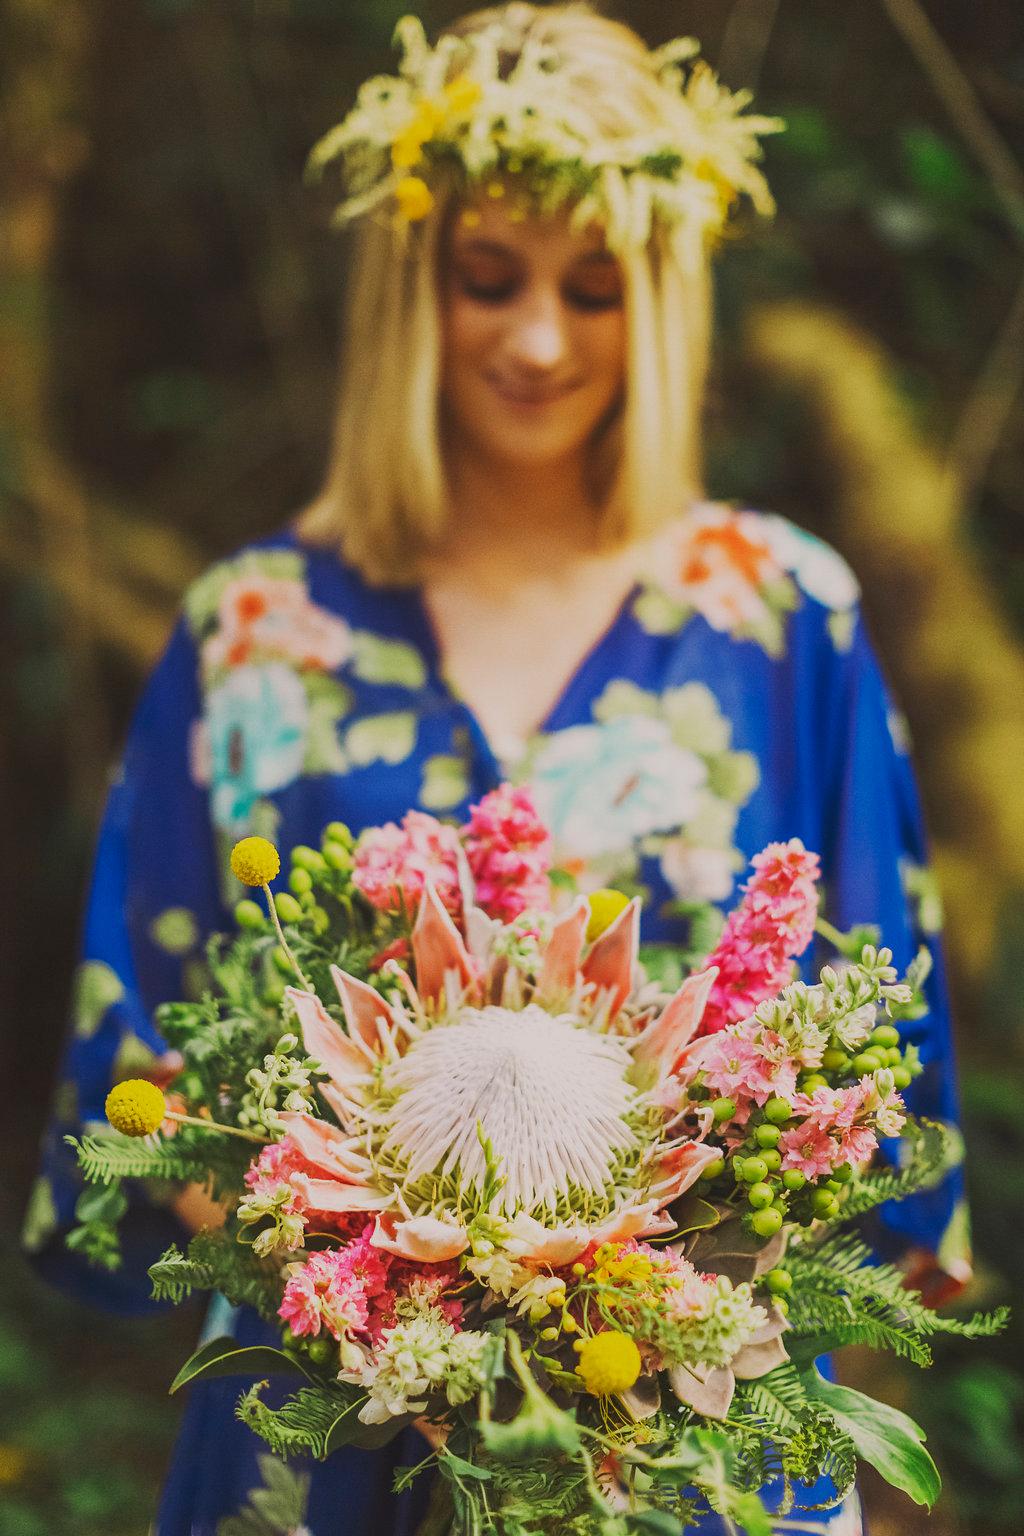 angie-diaz-photography-crisna-brandon-day-after-wedding-12.jpg